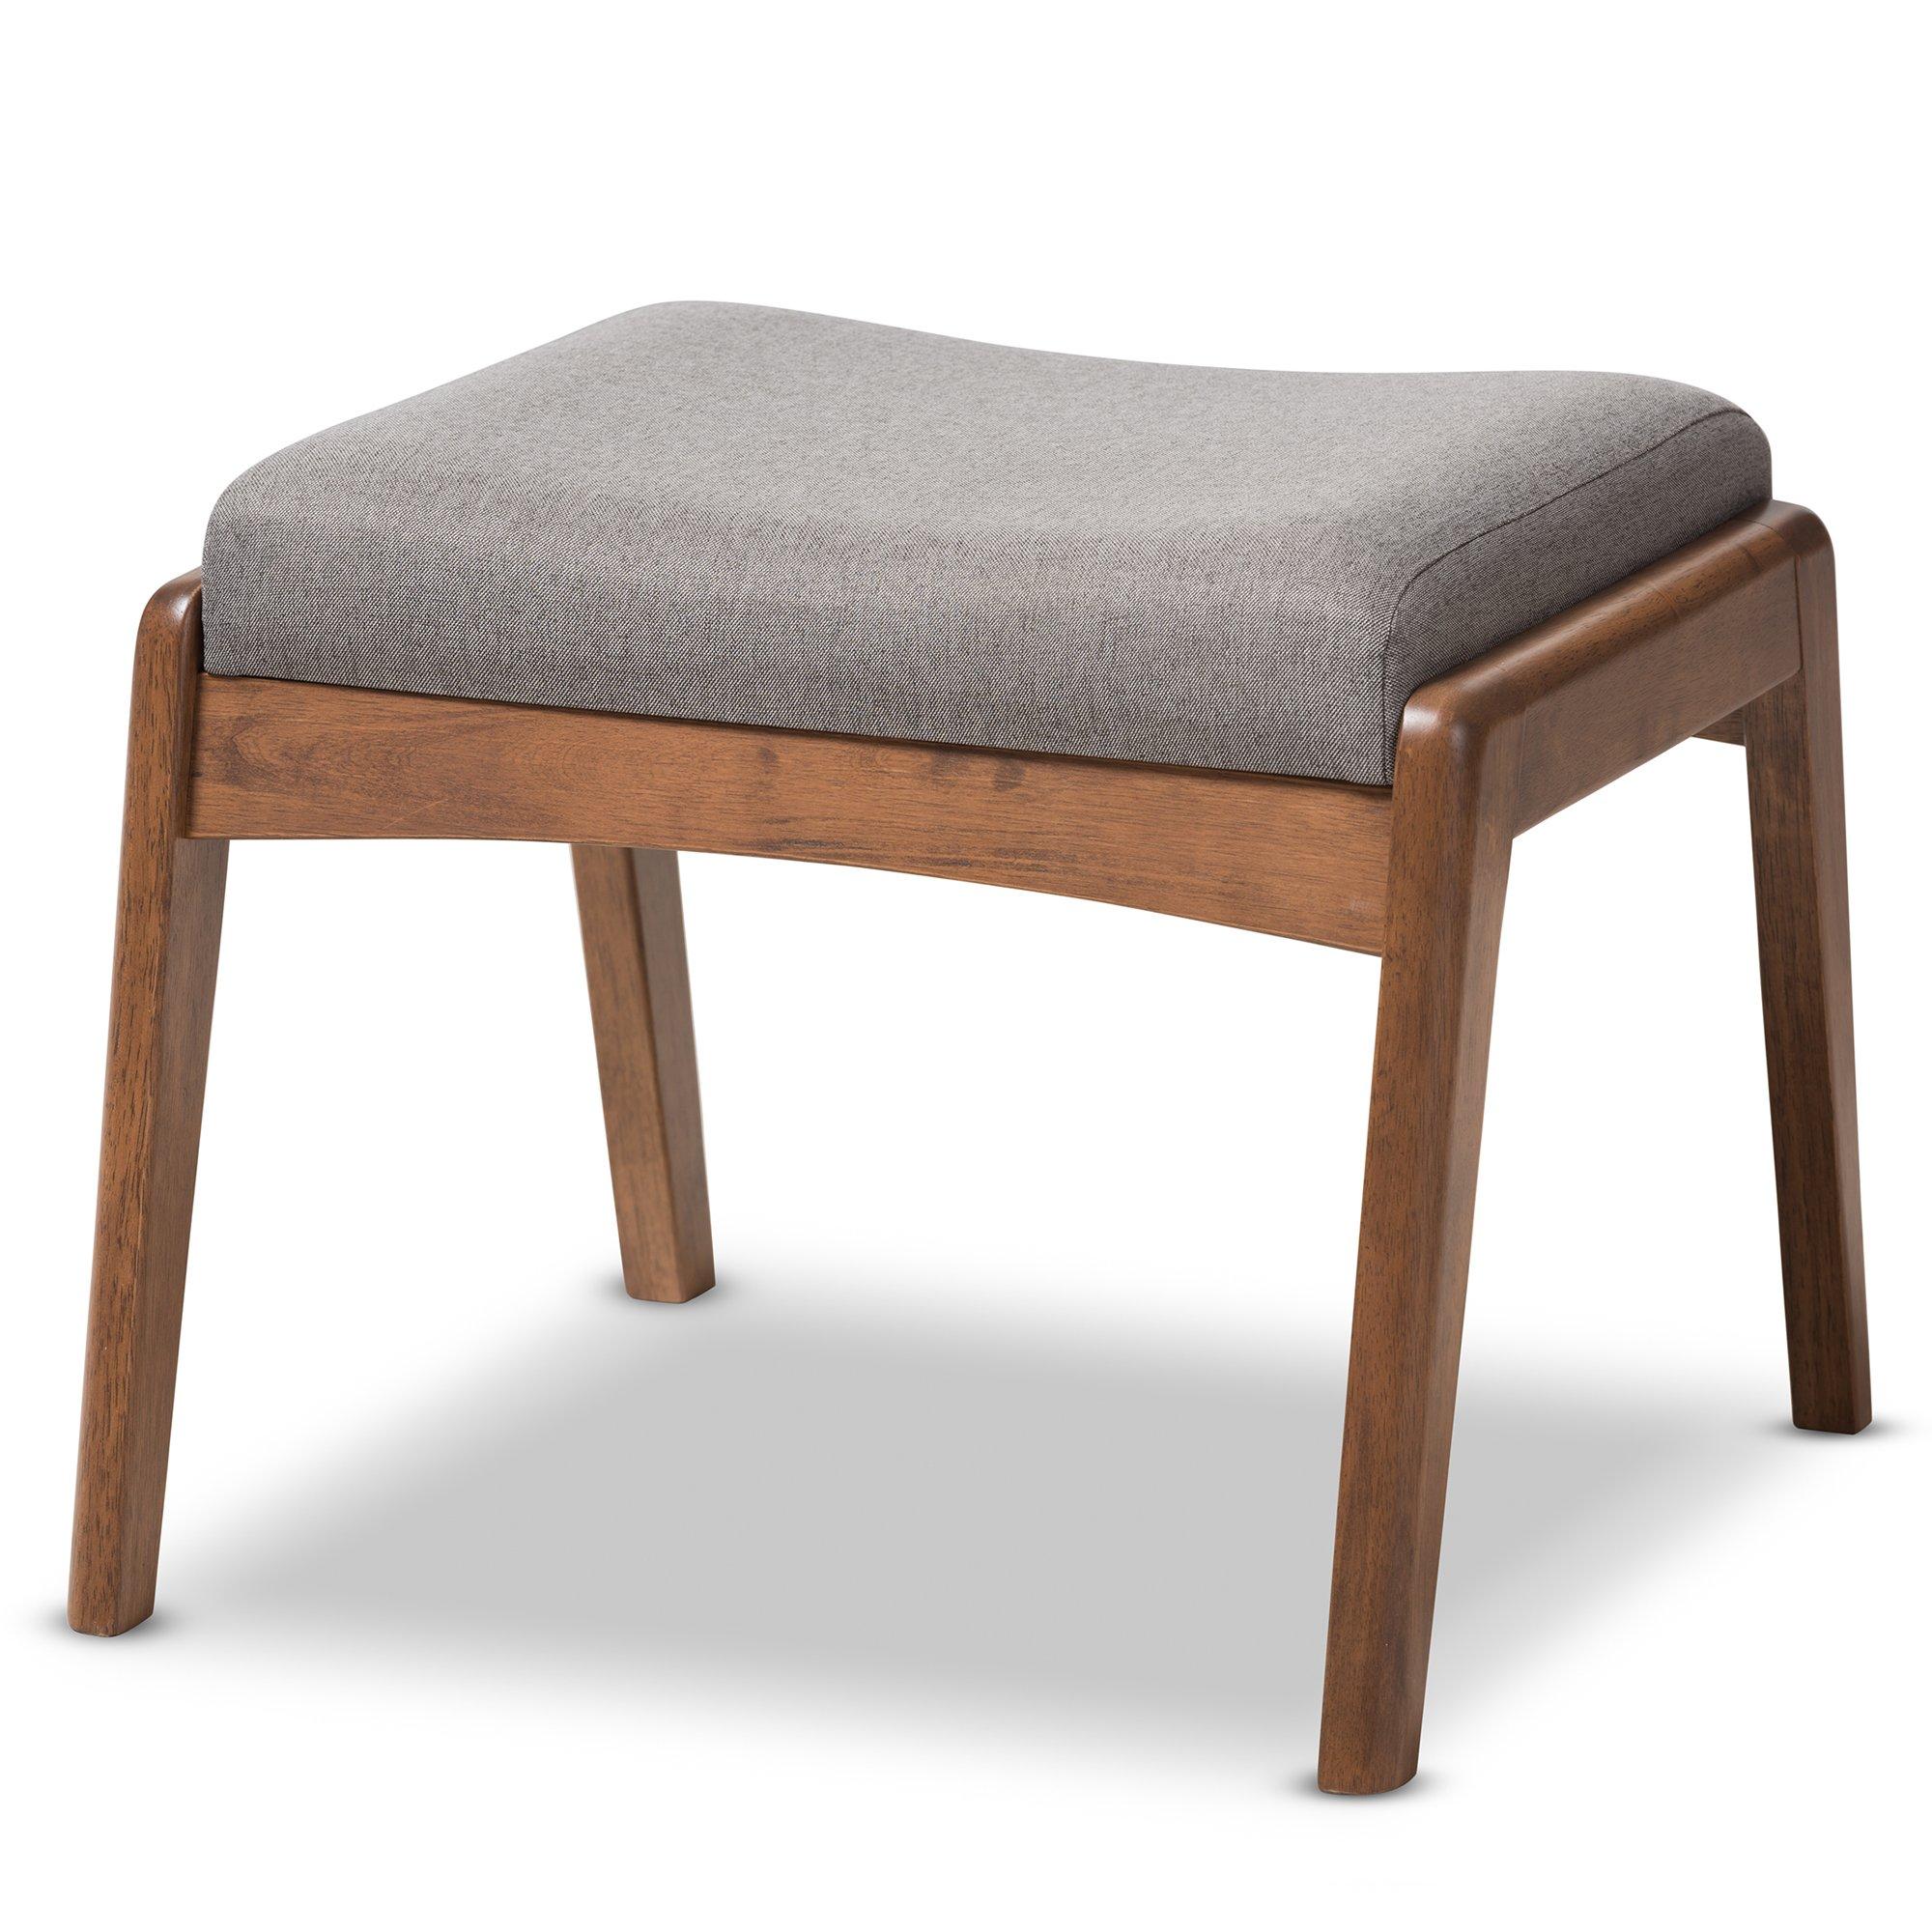 Baxton Studio Elyse Walnut Wood Grey Fabric Upholstered Footstool, Chair